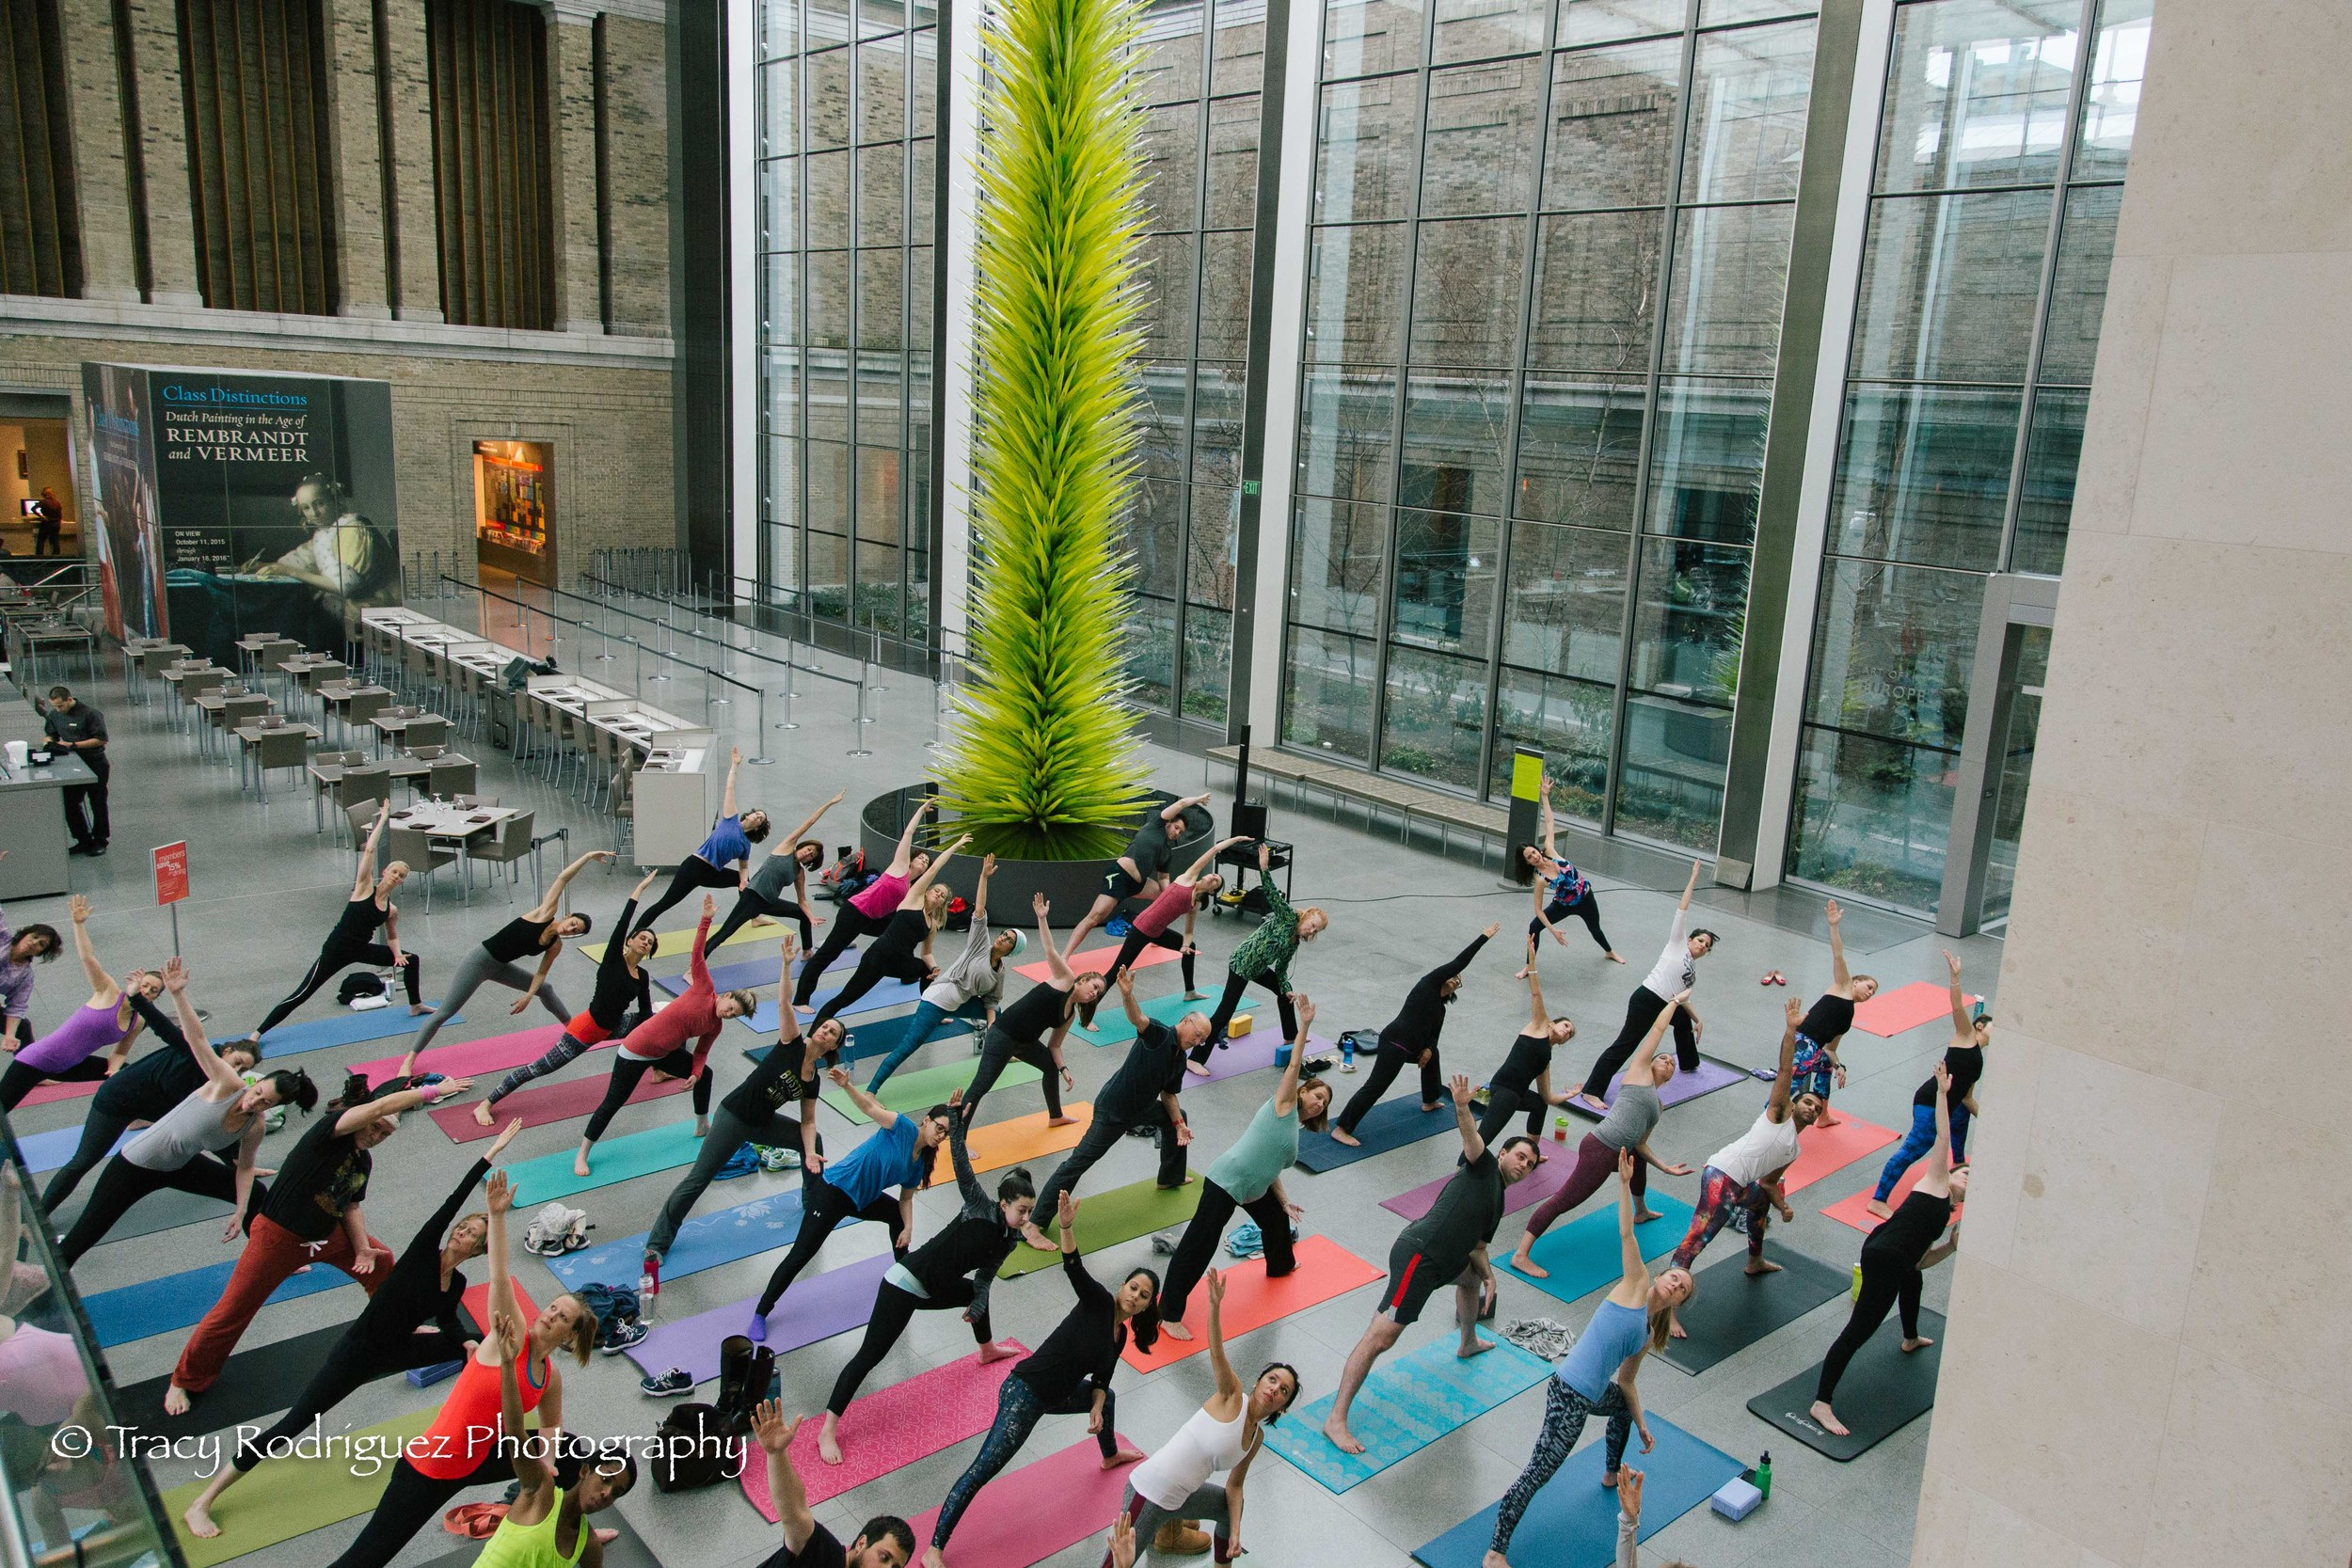 Boston Yoga Photographer at the MFA - Tracy Rodriguez Photography